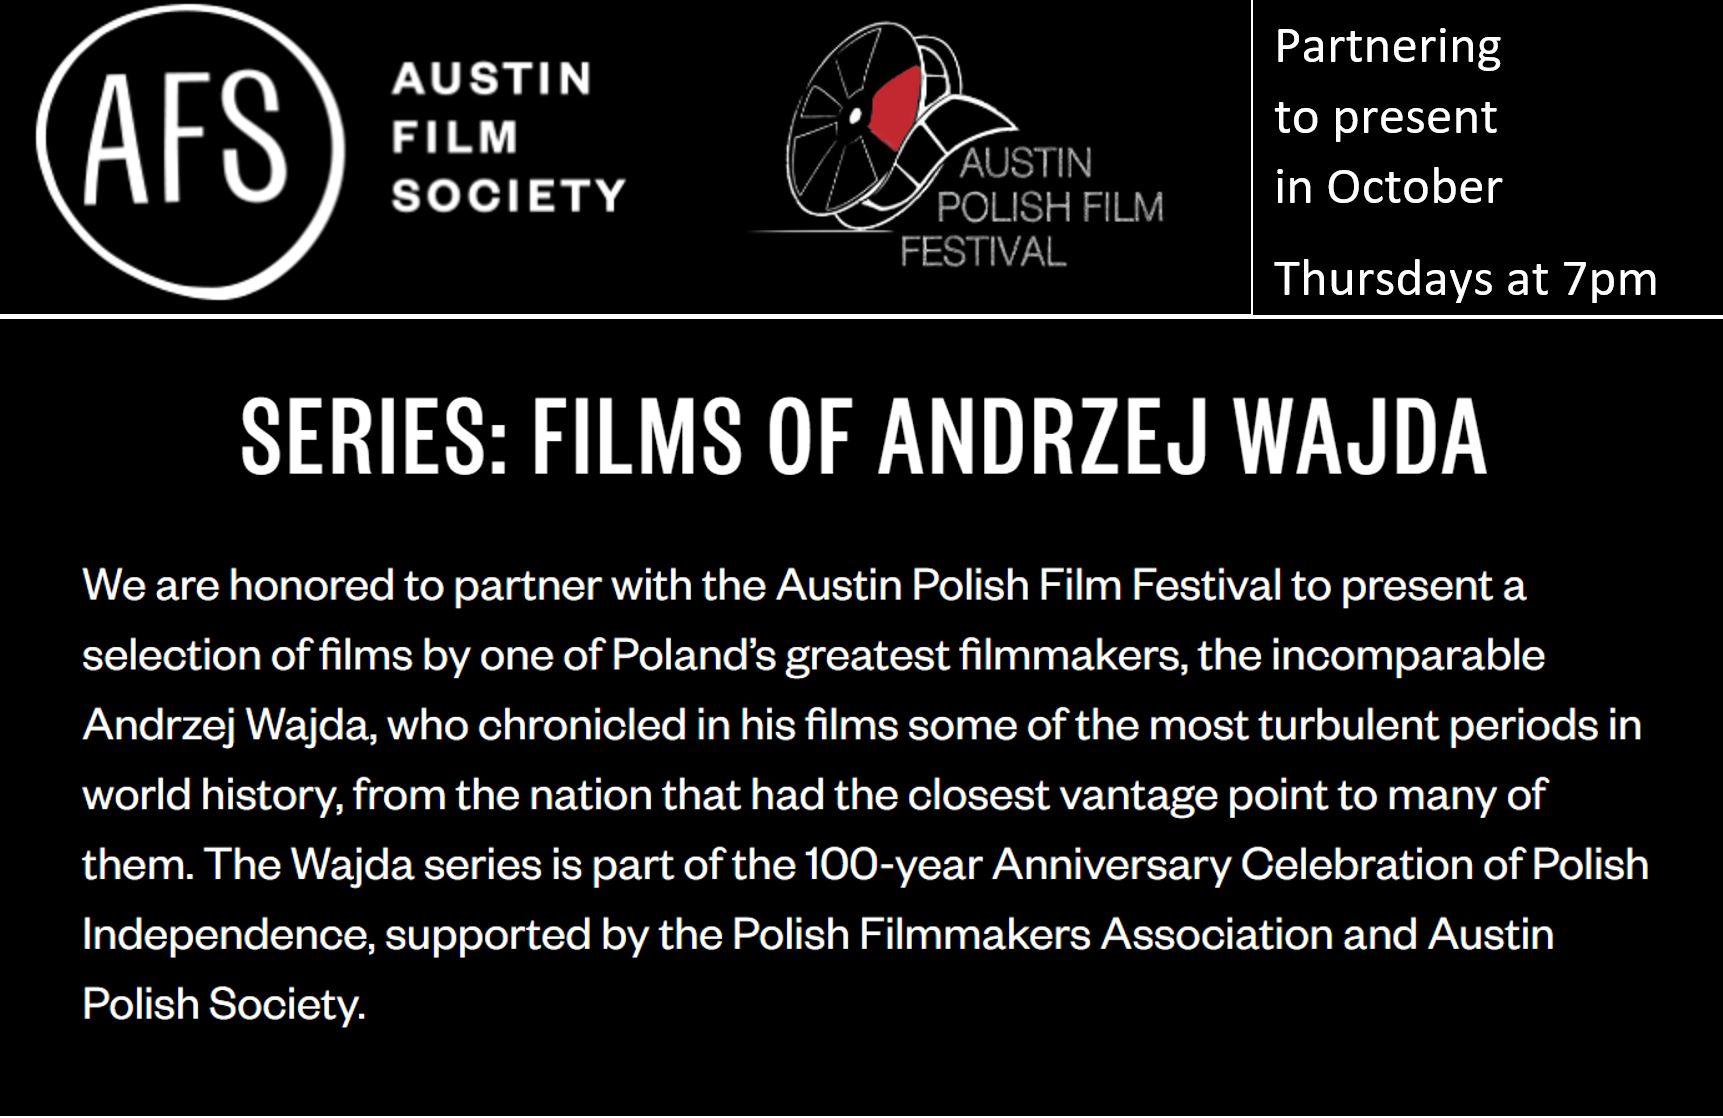 Wajda 4 films announcement.JPG